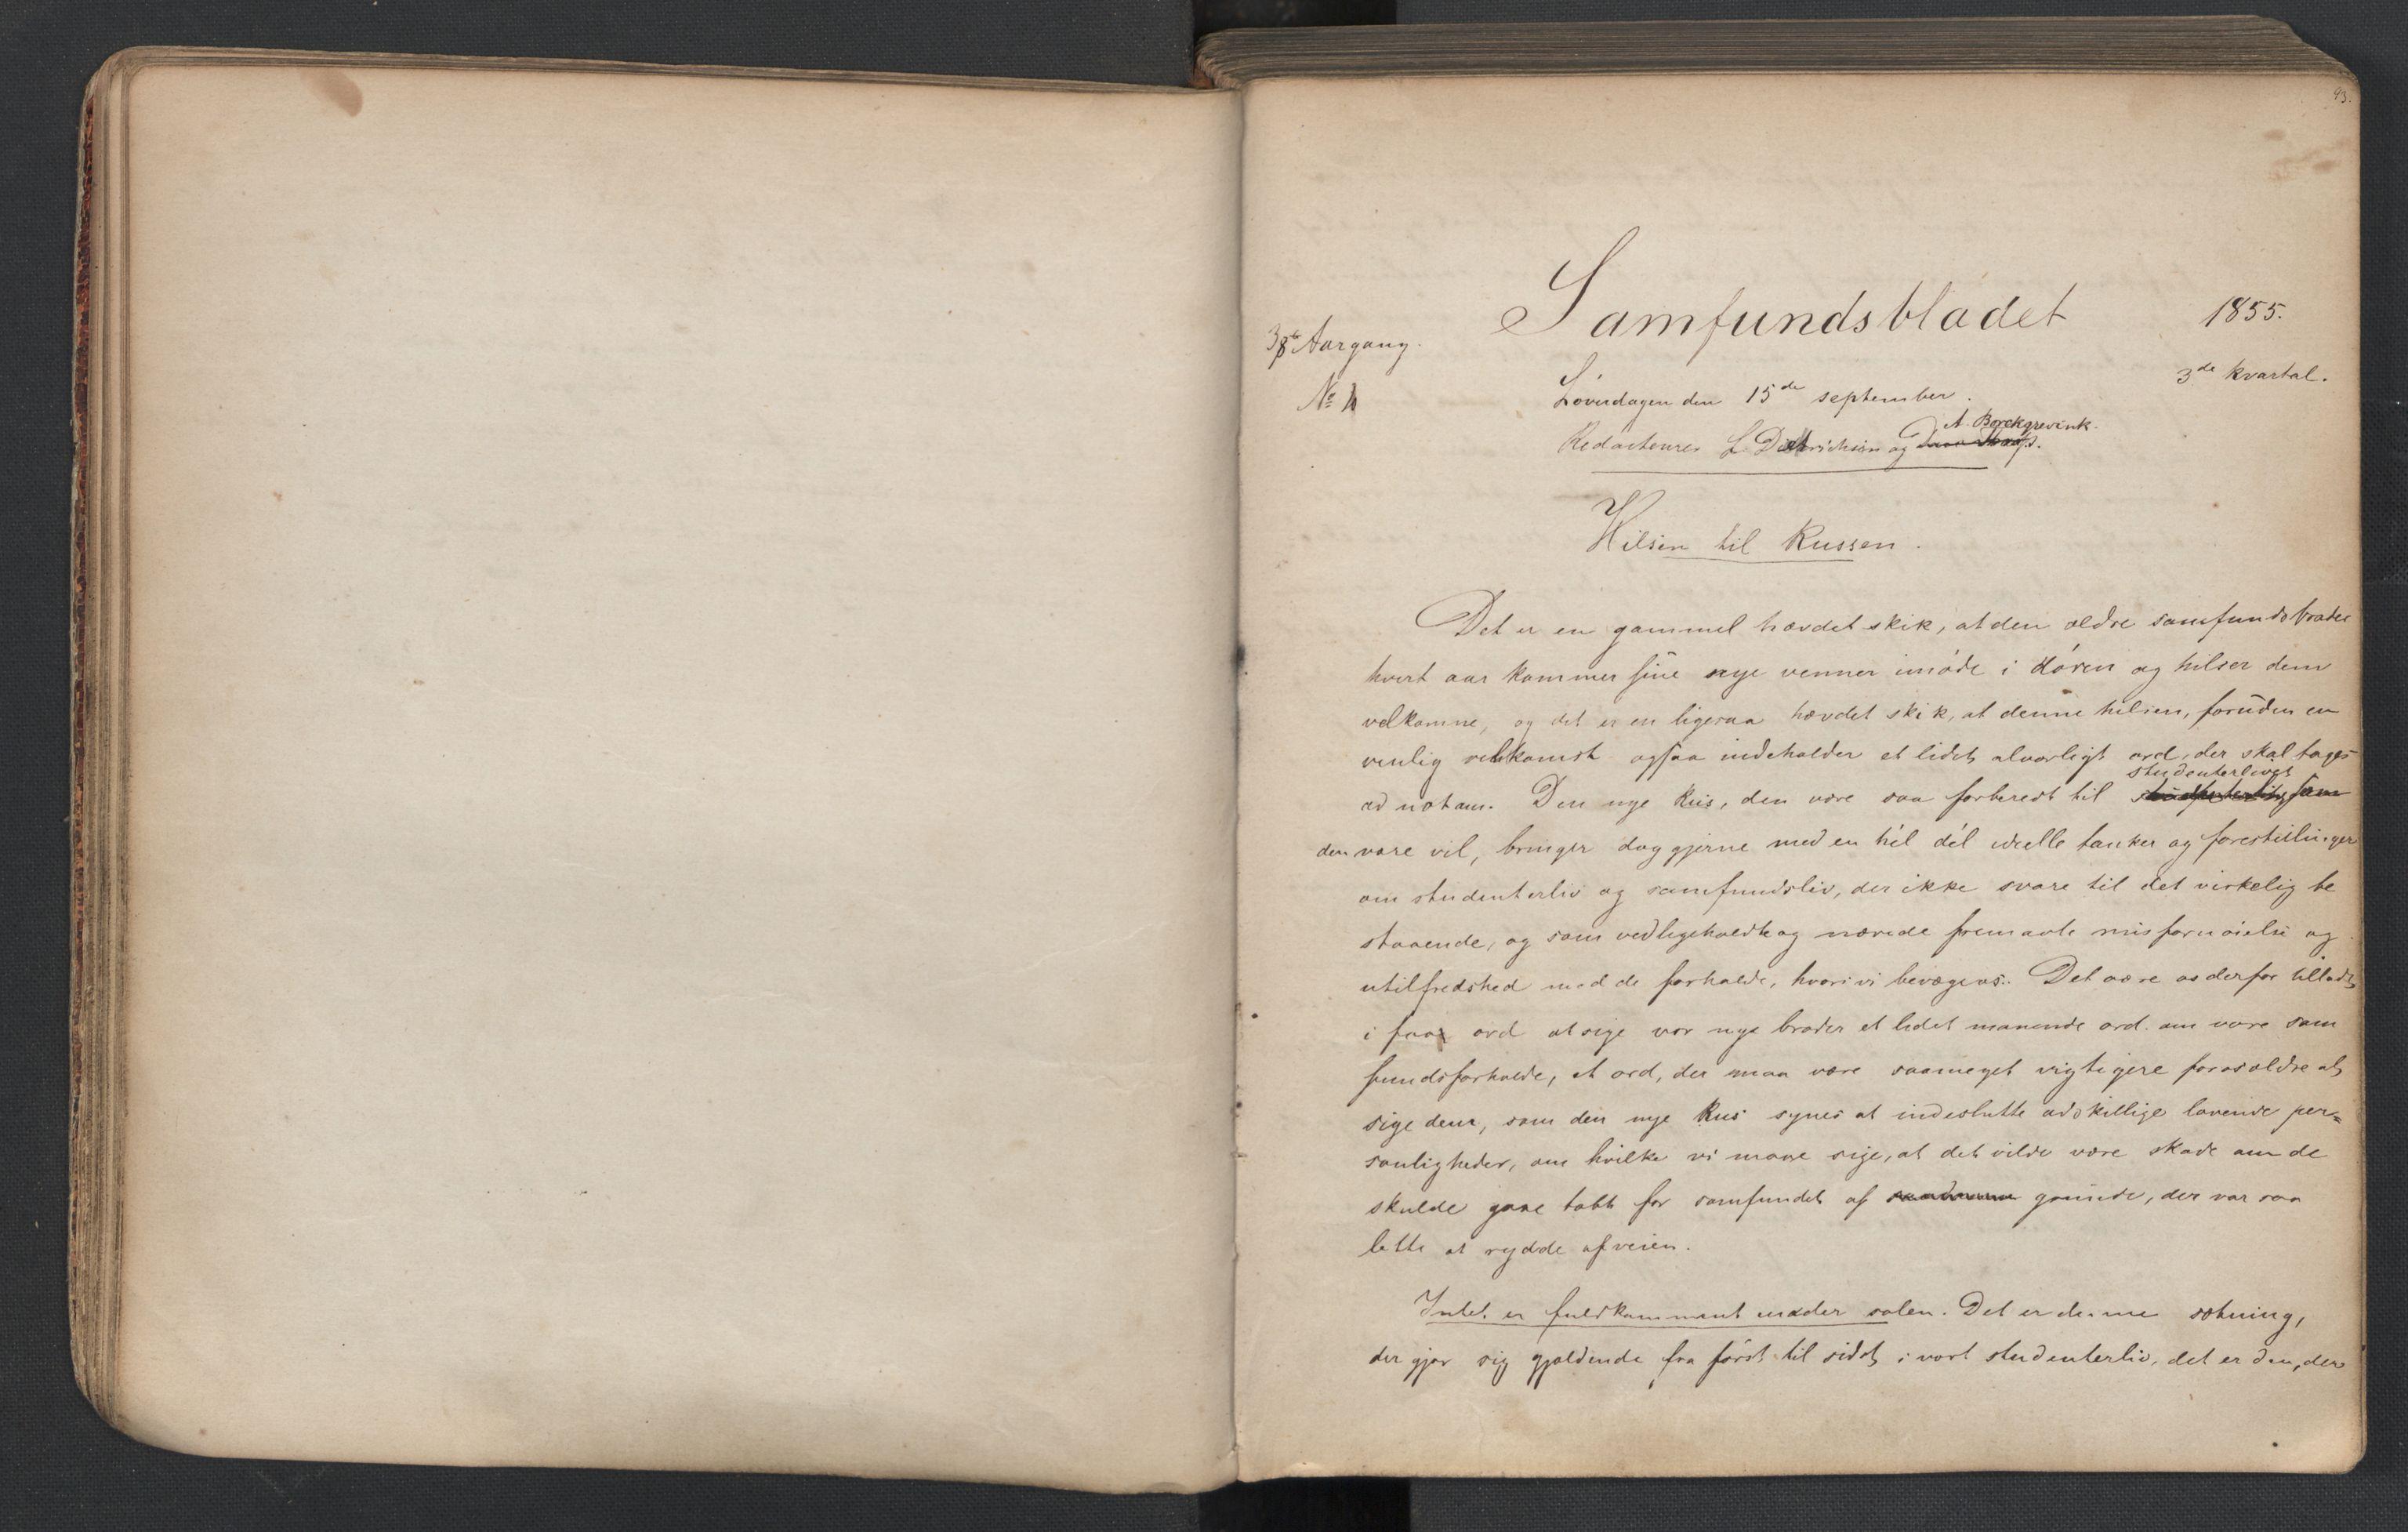 RA, Det Norske Studentersamfund, X/Xa/L0005, 1855-1856, s. 23